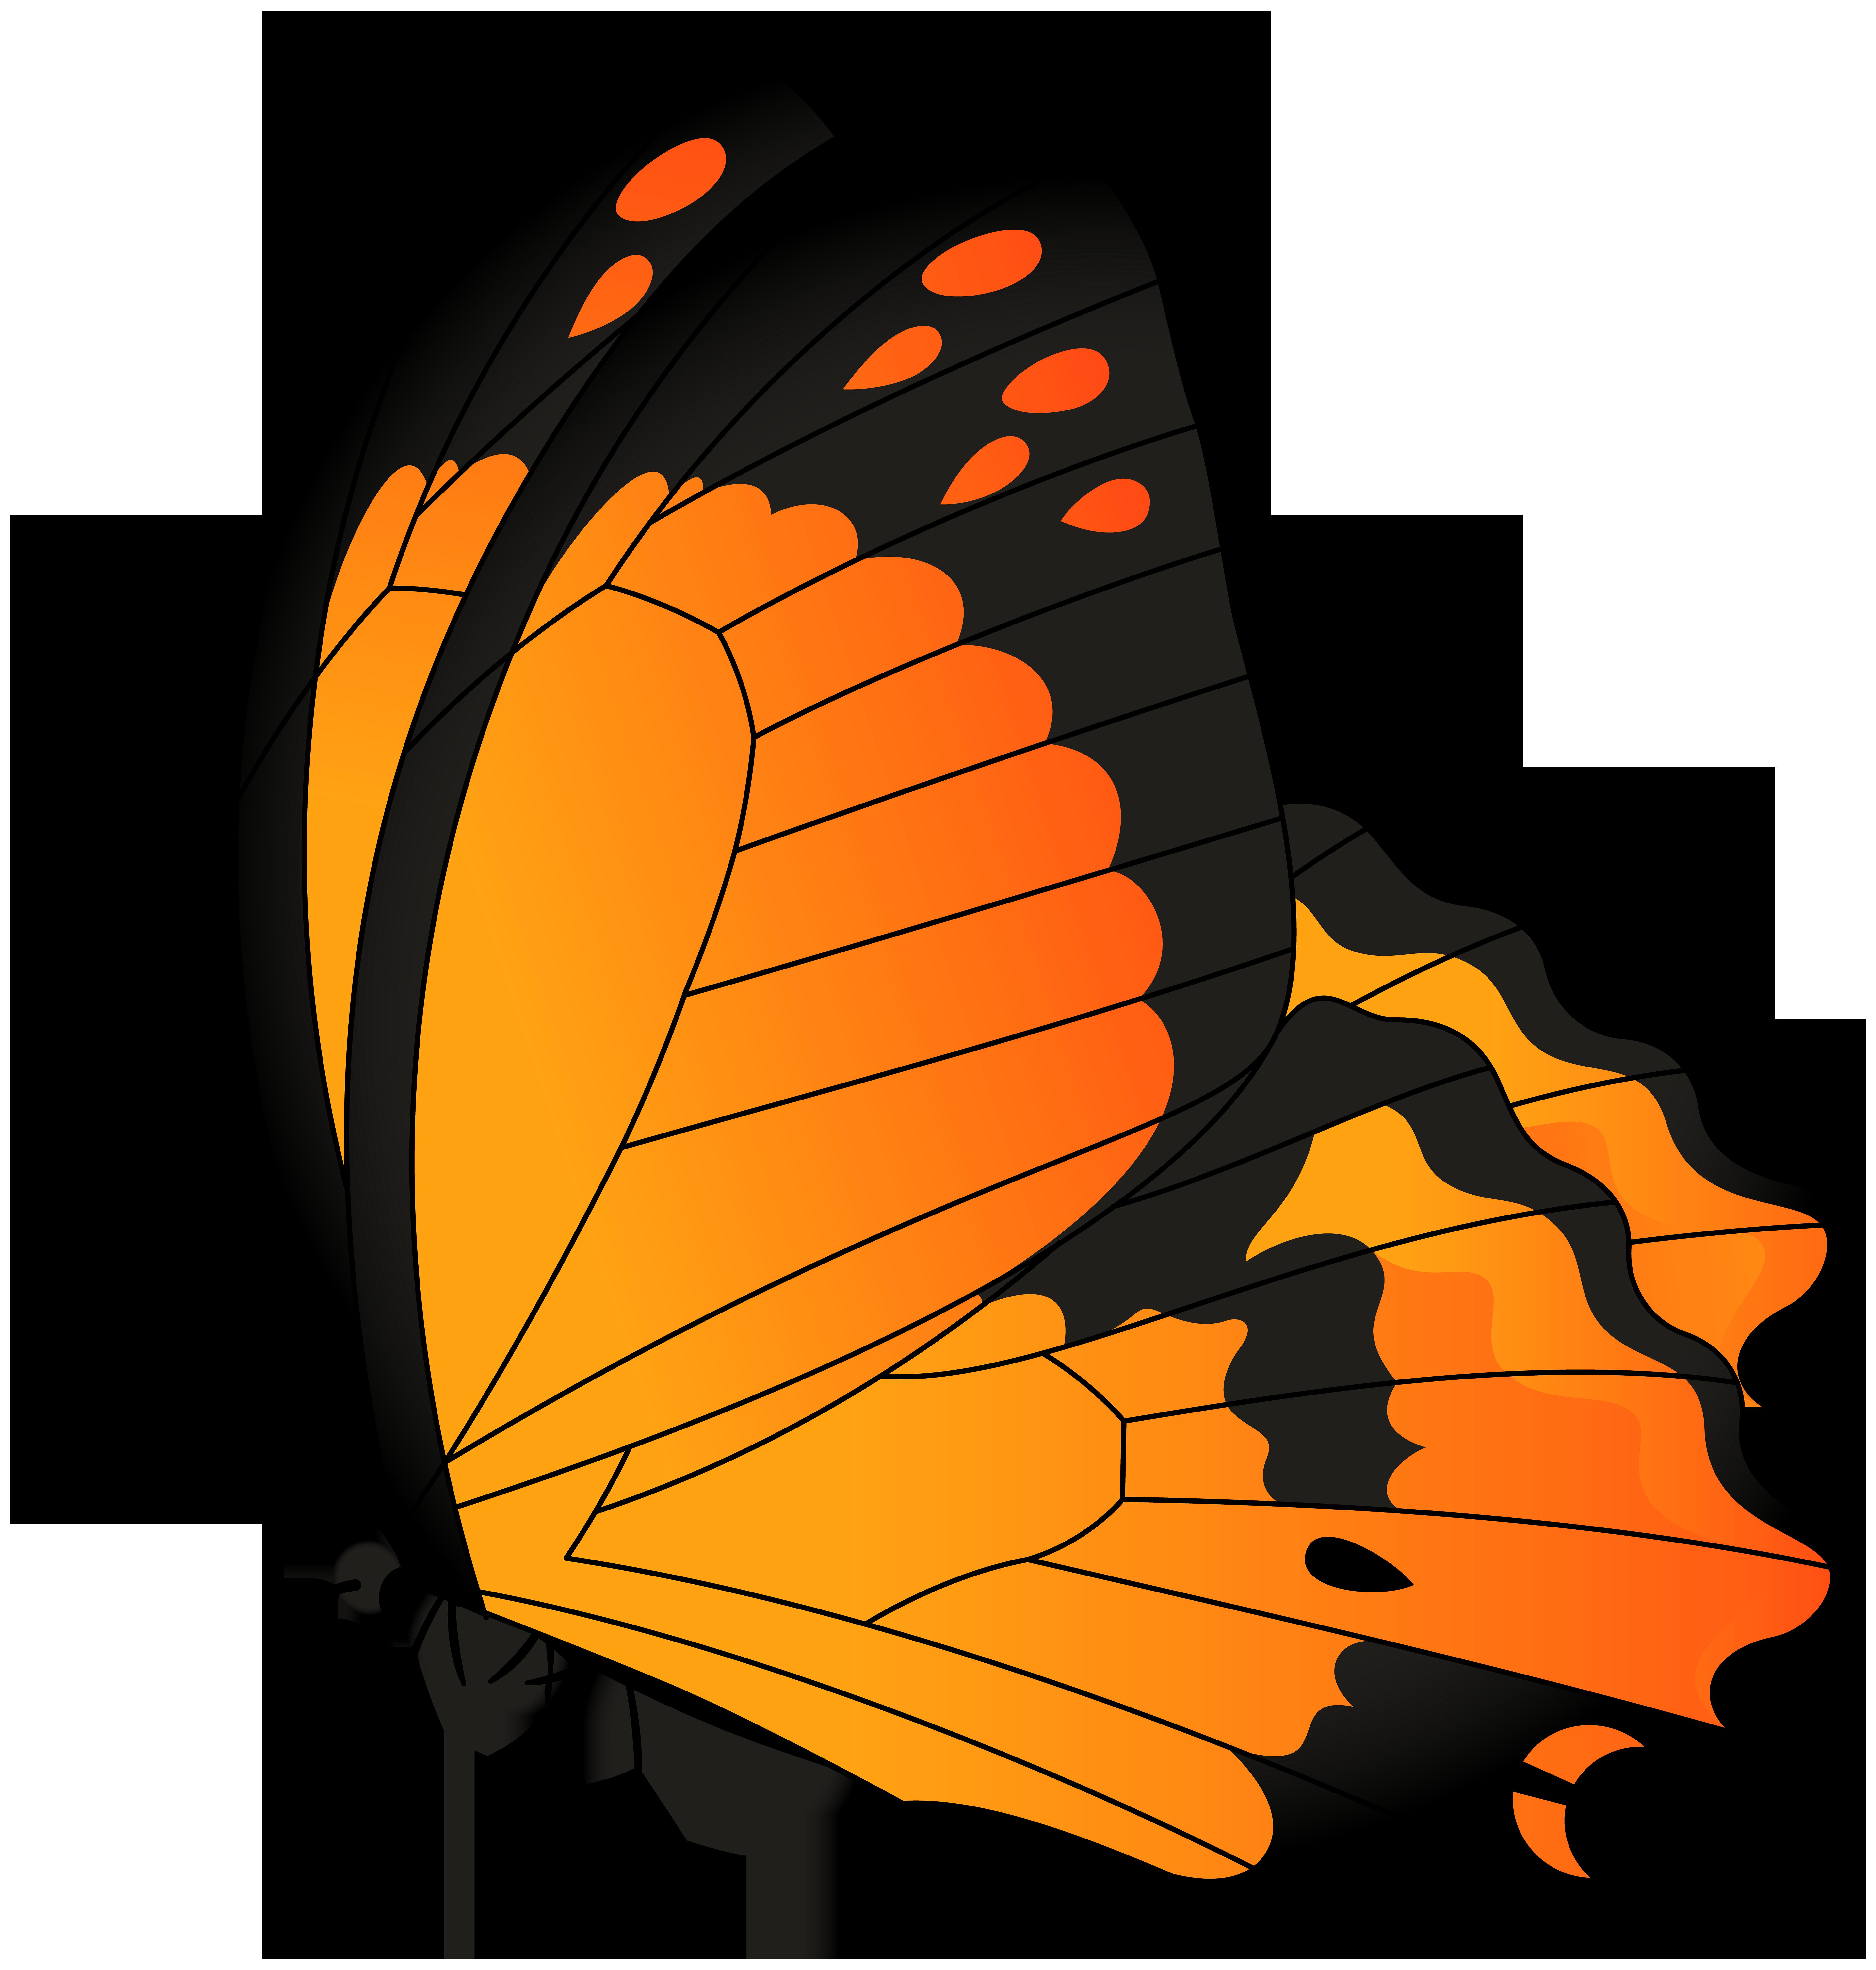 Butterfly orange transparent.